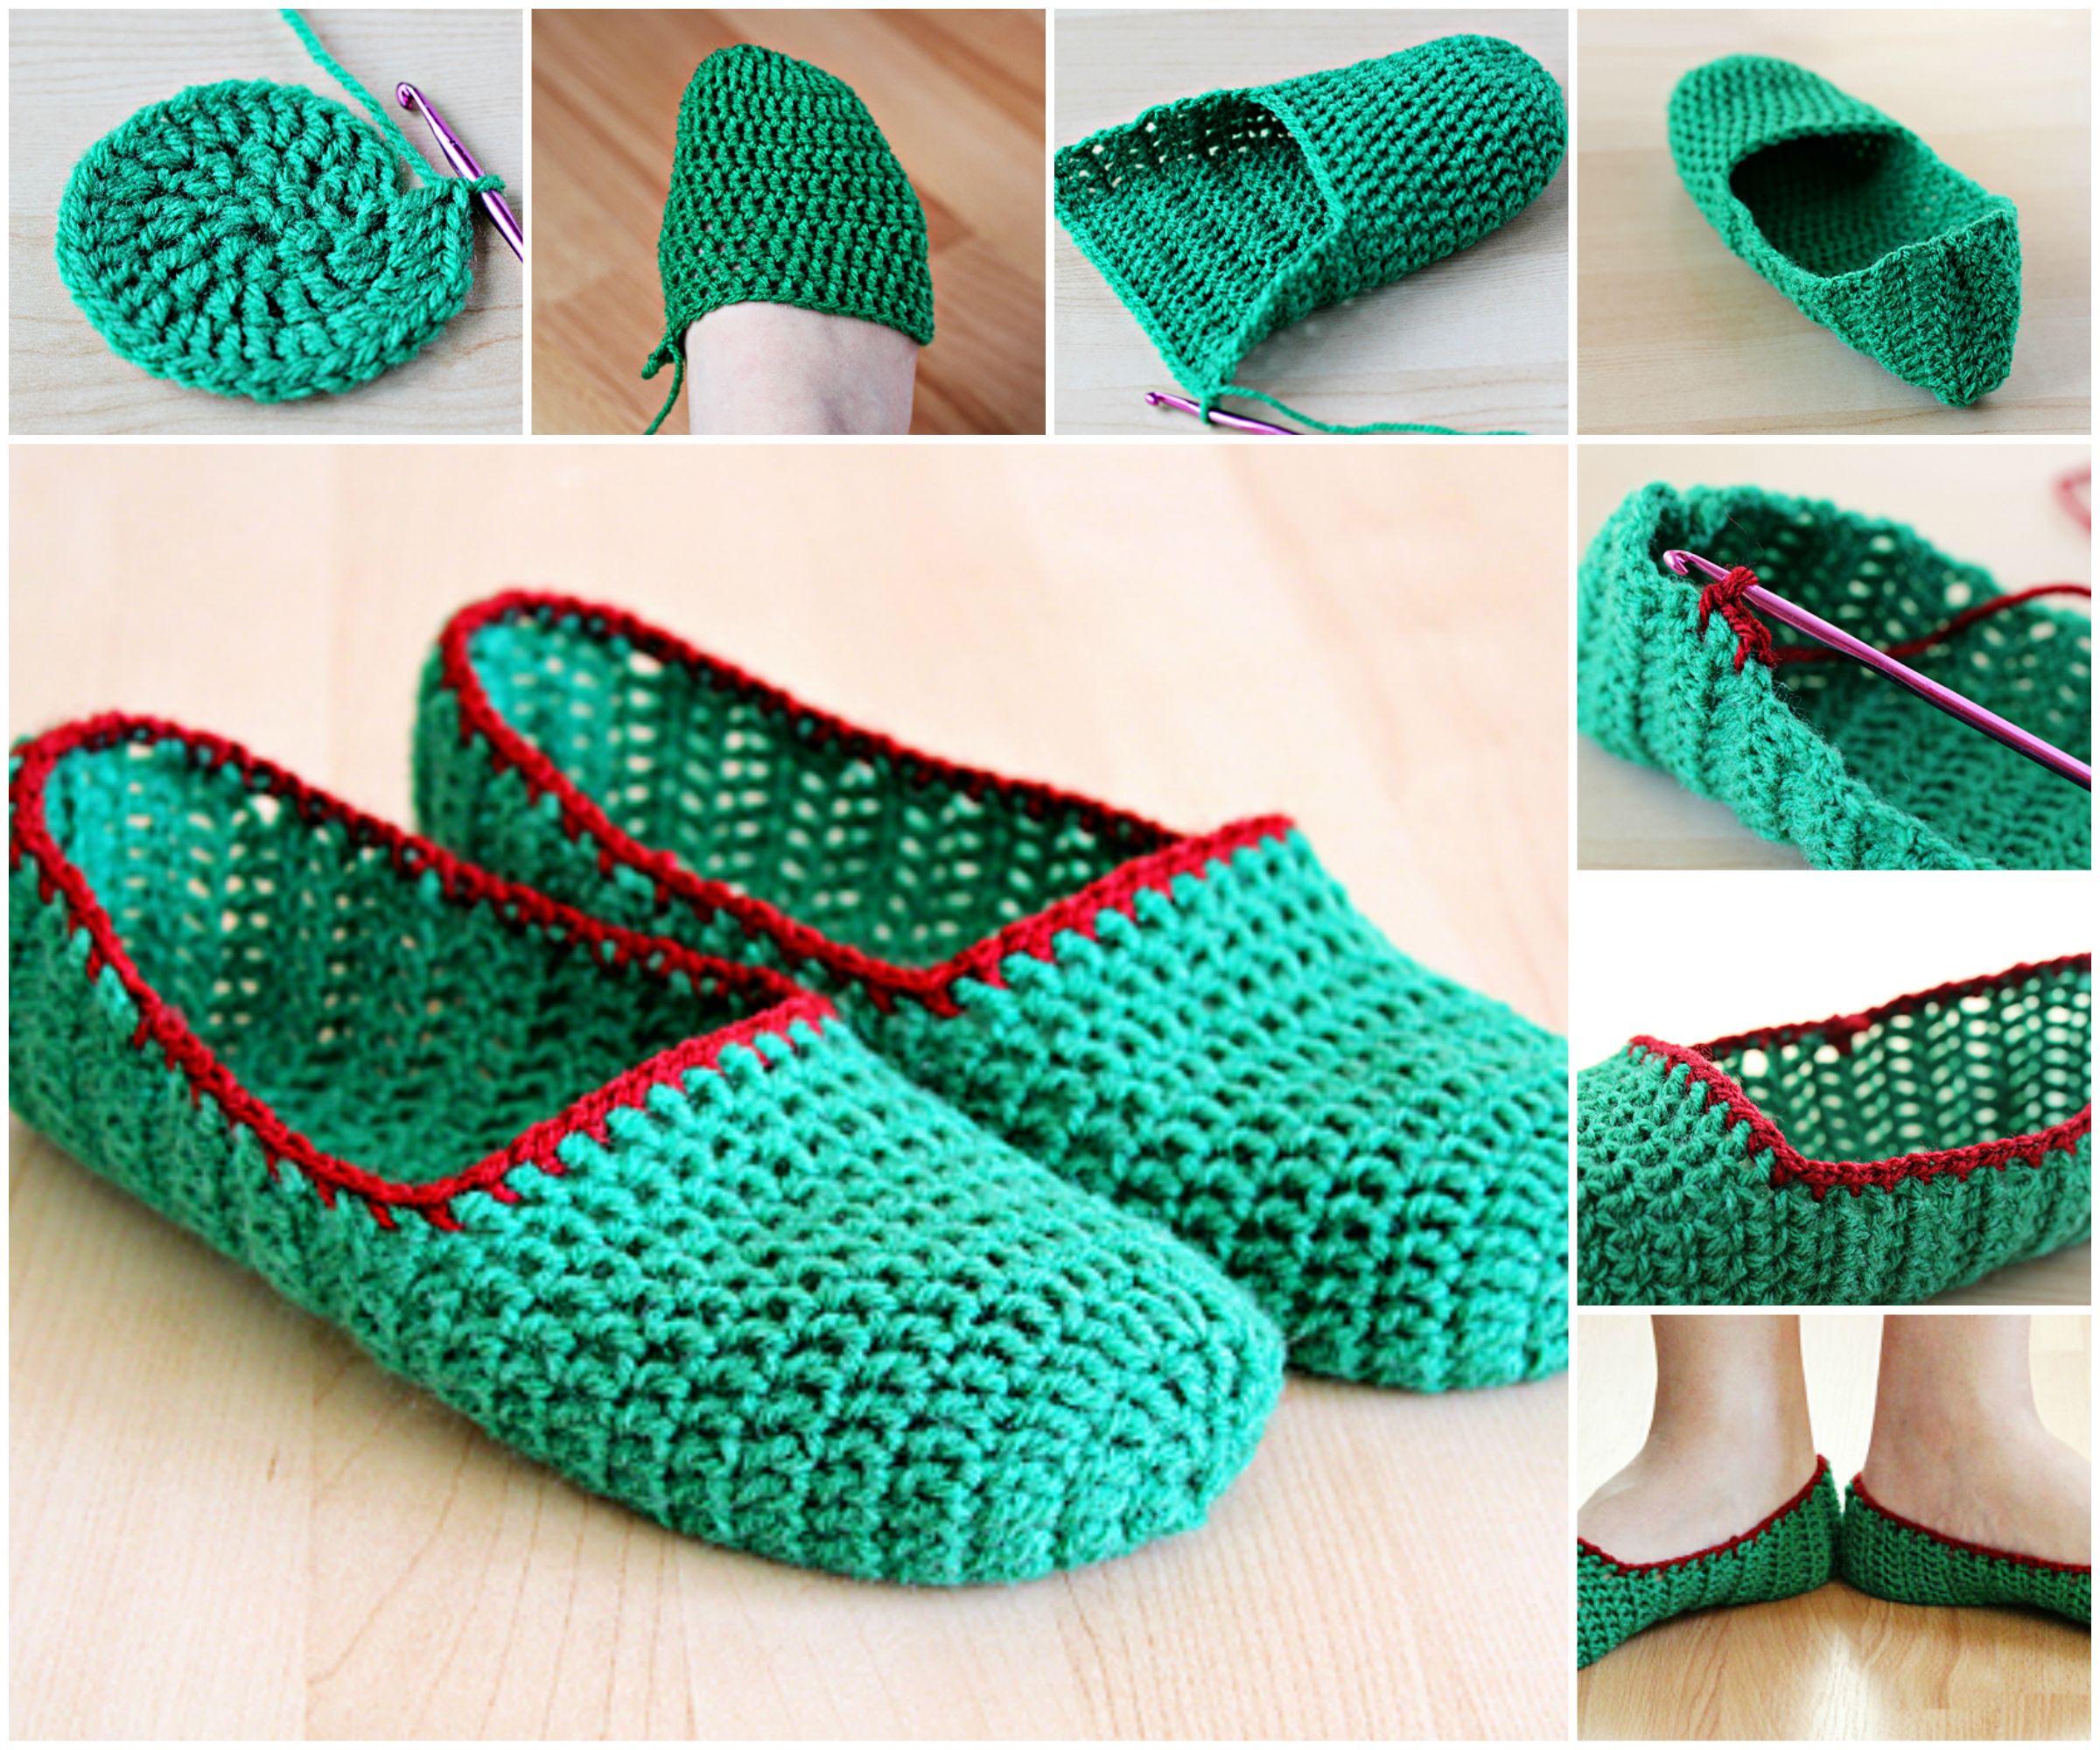 Creative DIY Simple Crochet Slippers